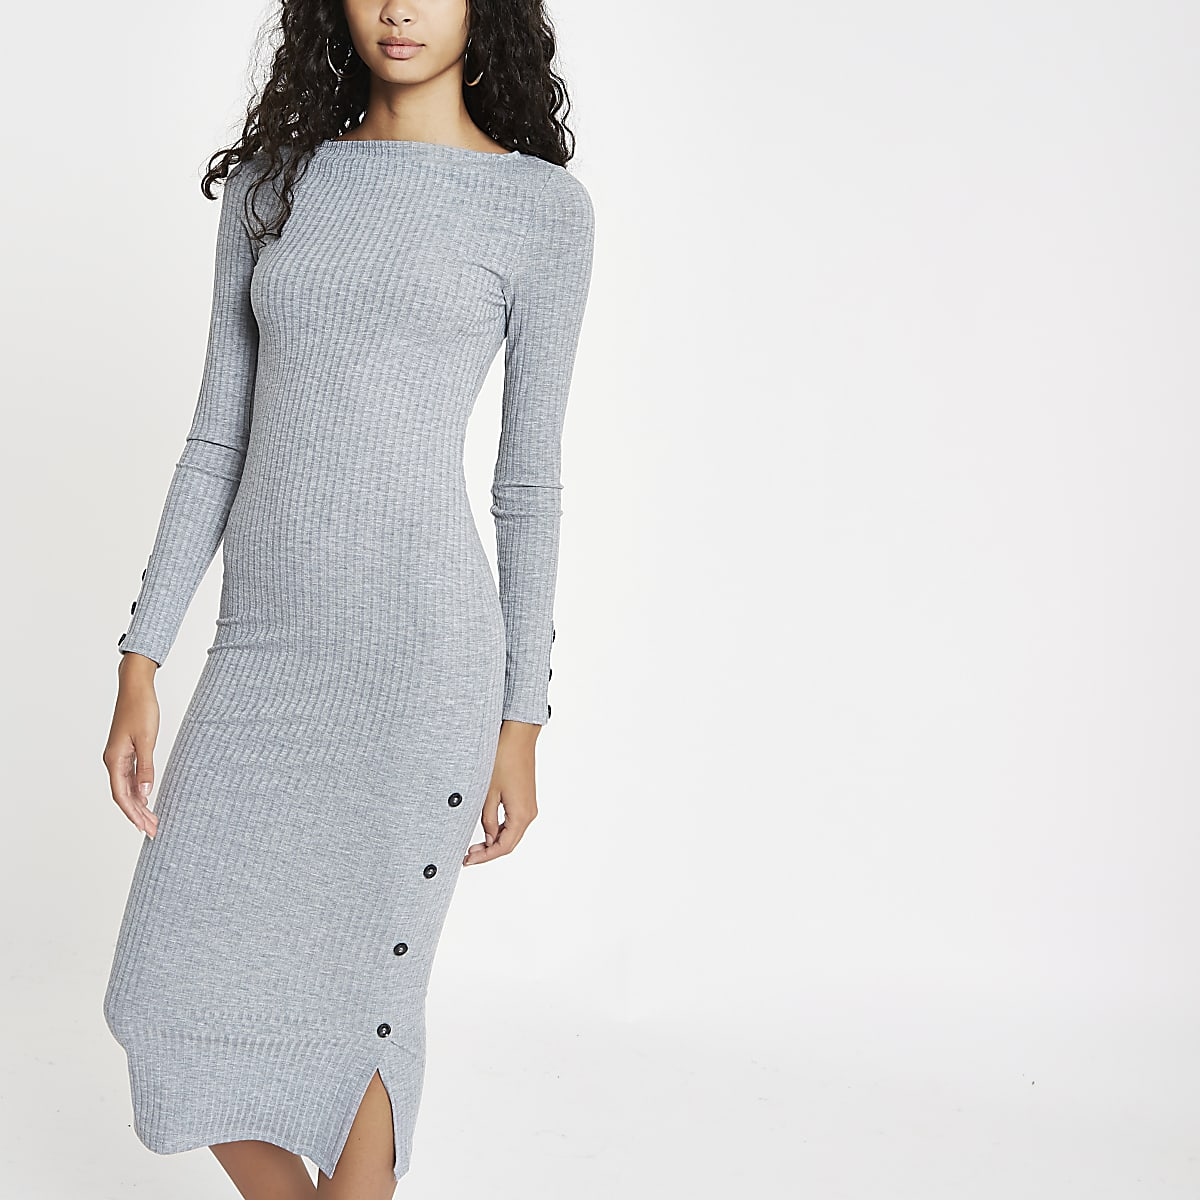 2b7cf6b35309 Grey marl rib button side midi dress - Bodycon Dresses - Dresses - women